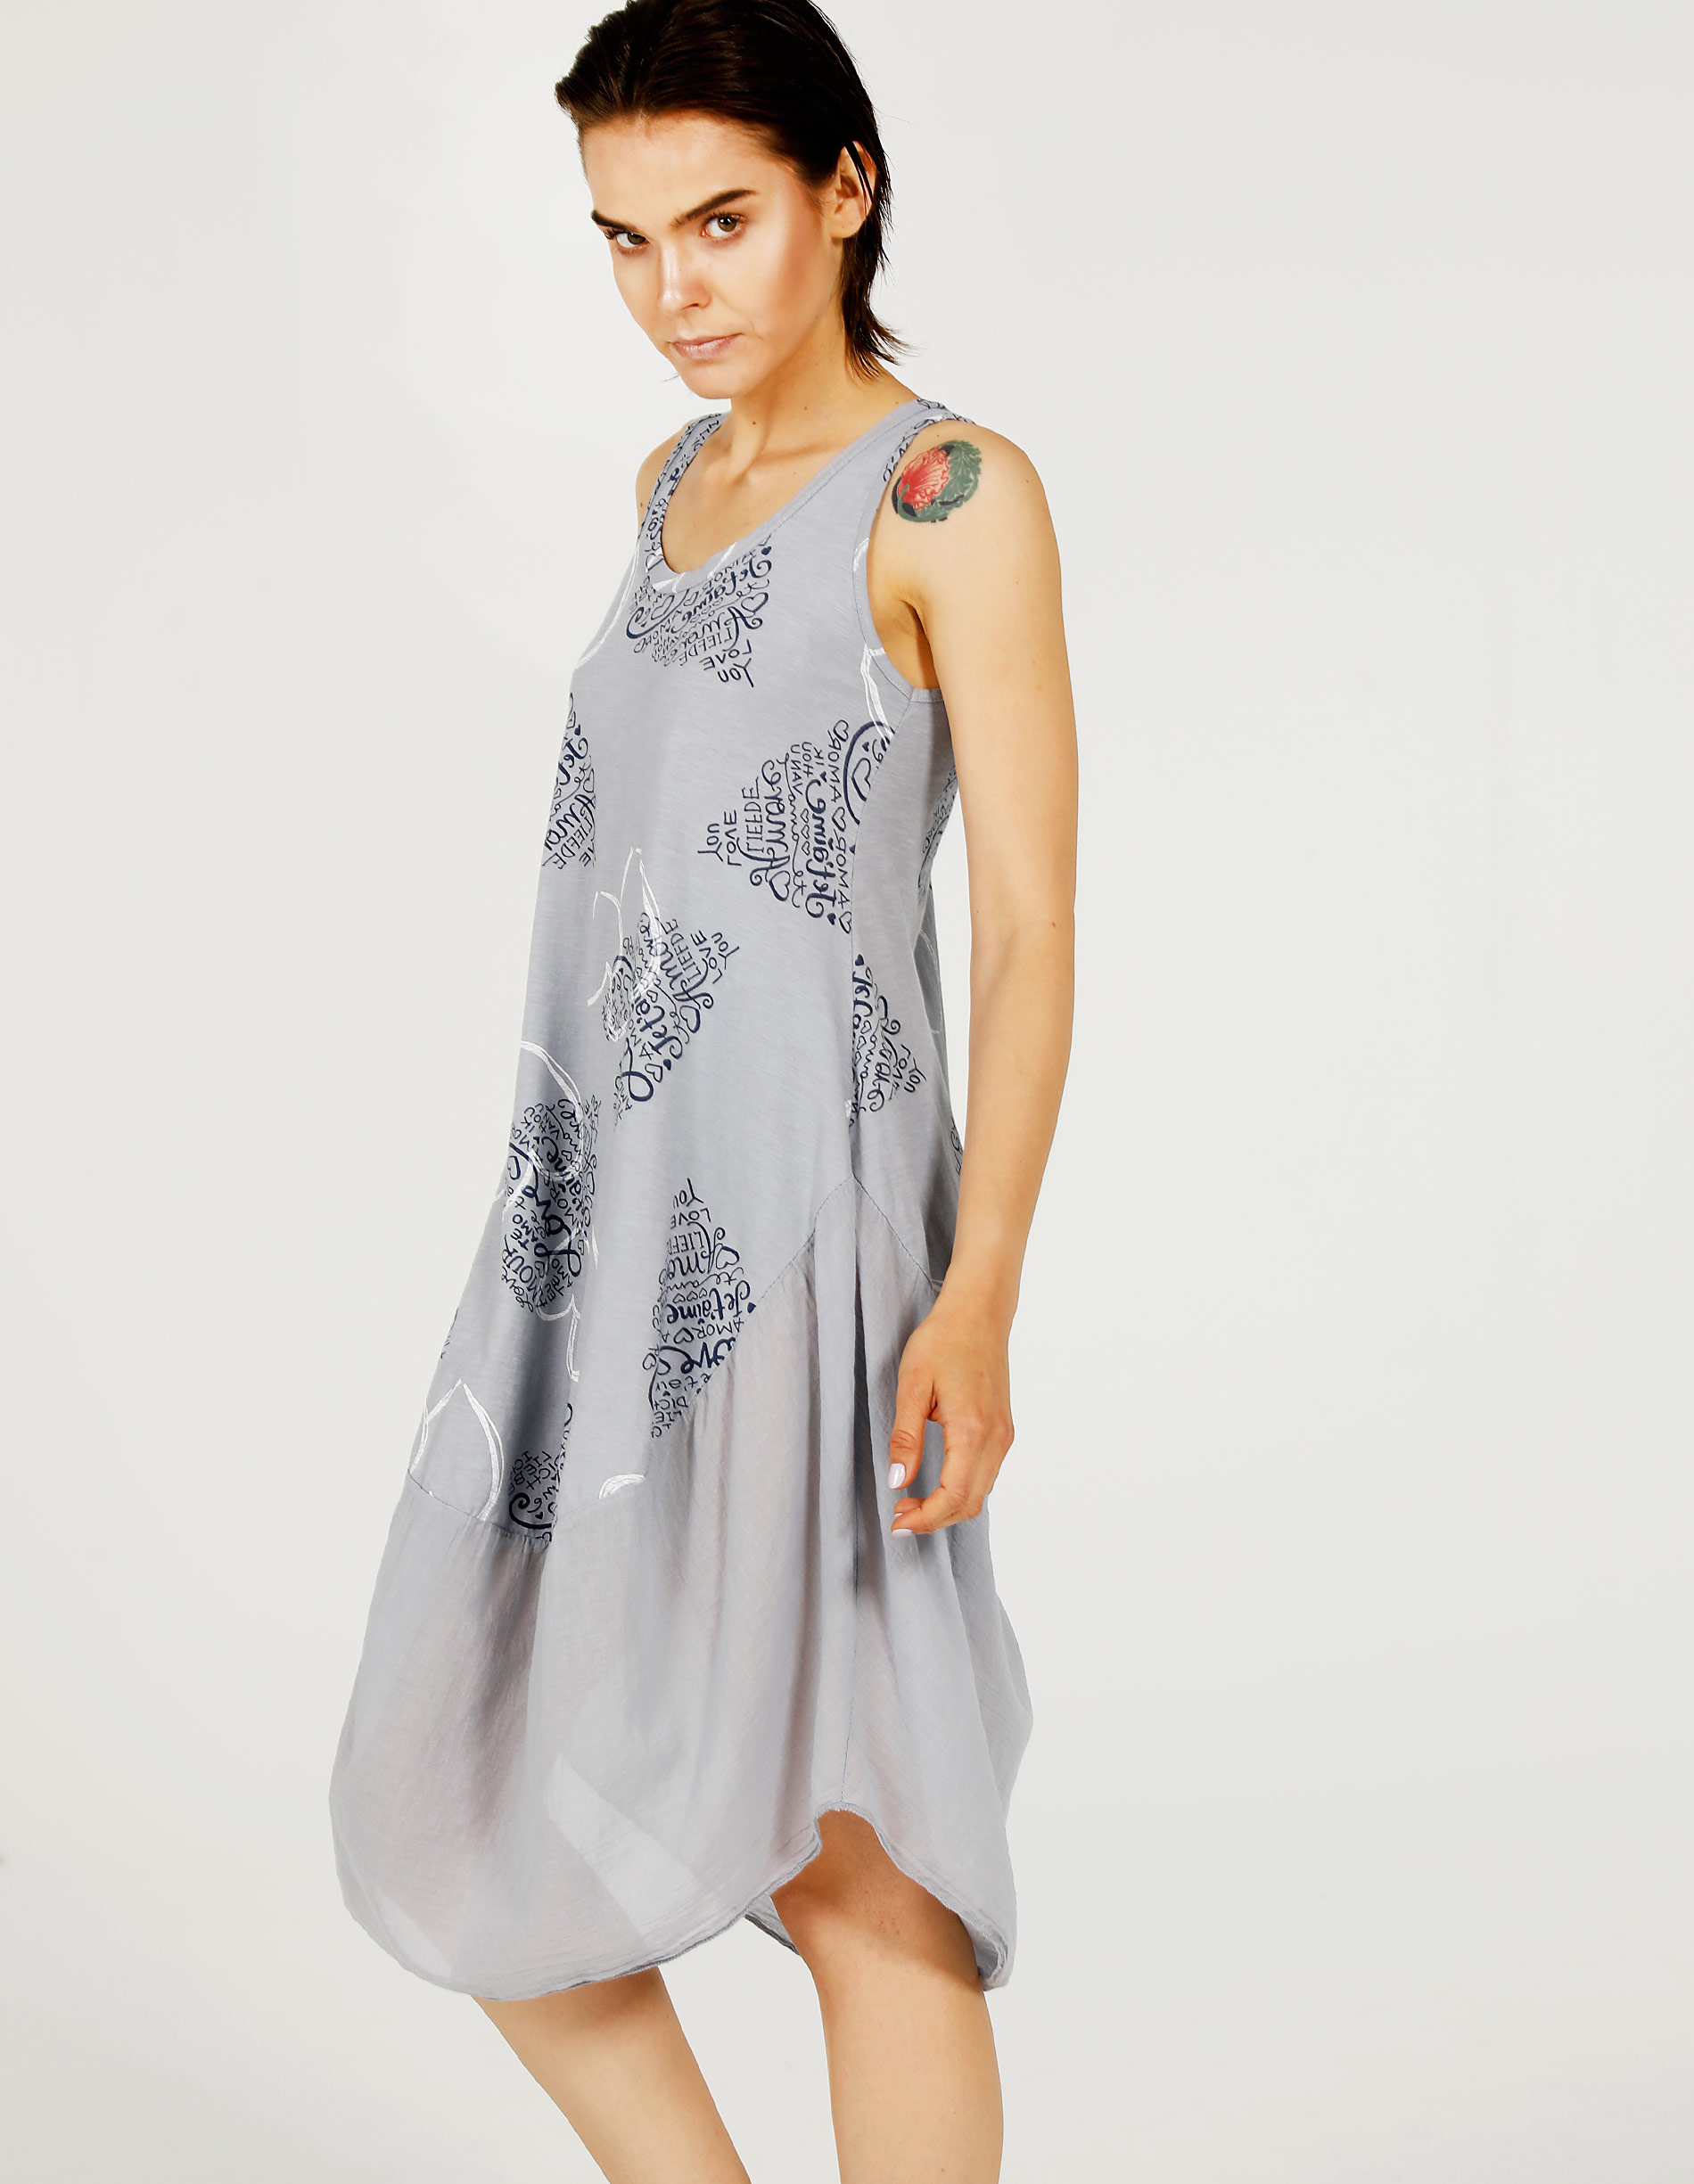 Sukienka - 18-13576O PER - Unisono